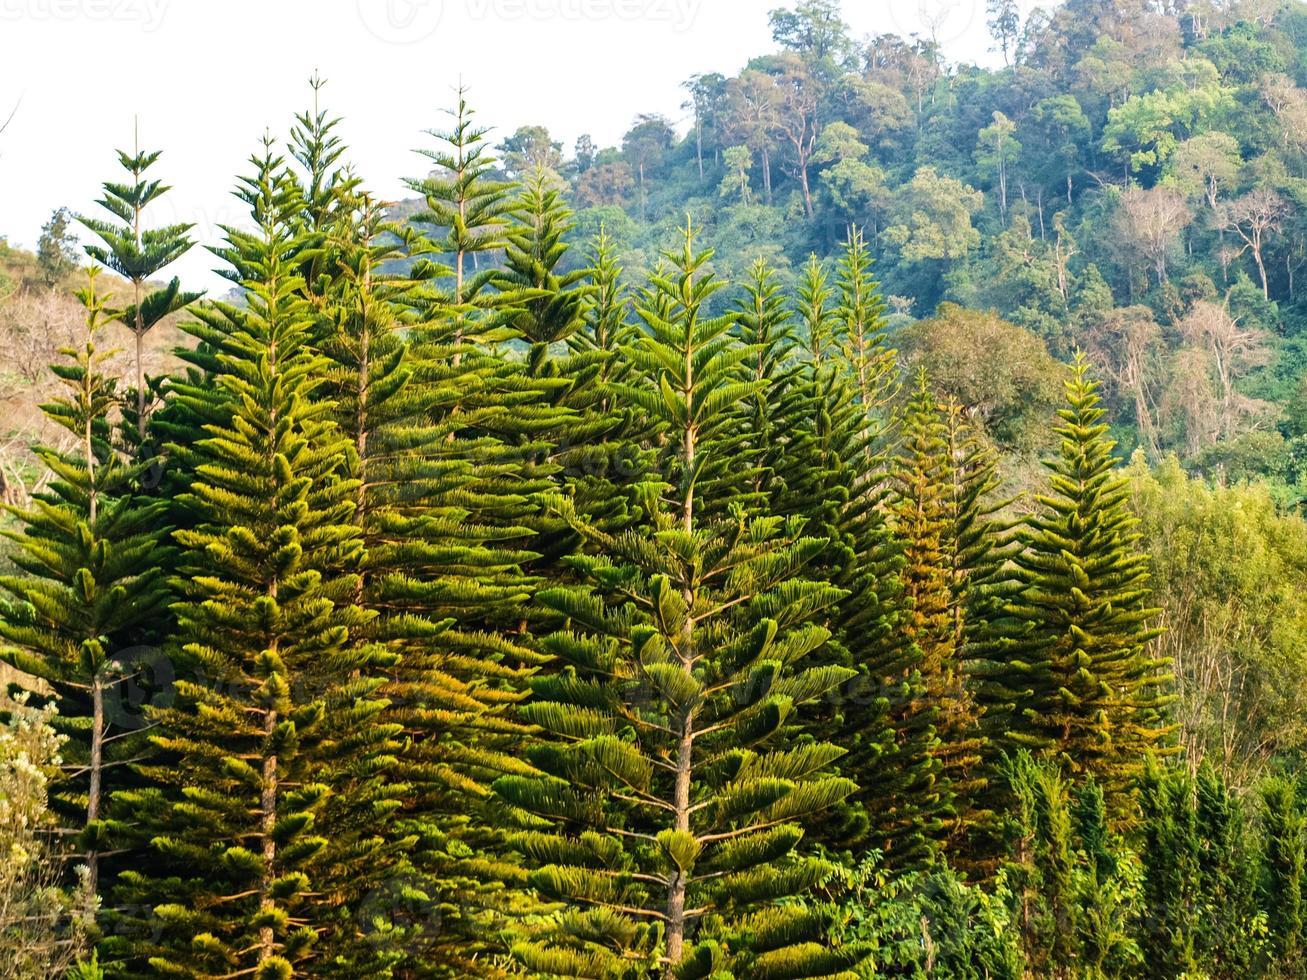 Cedar trees forest in Chang hill, Chiang Rai, Thailand photo